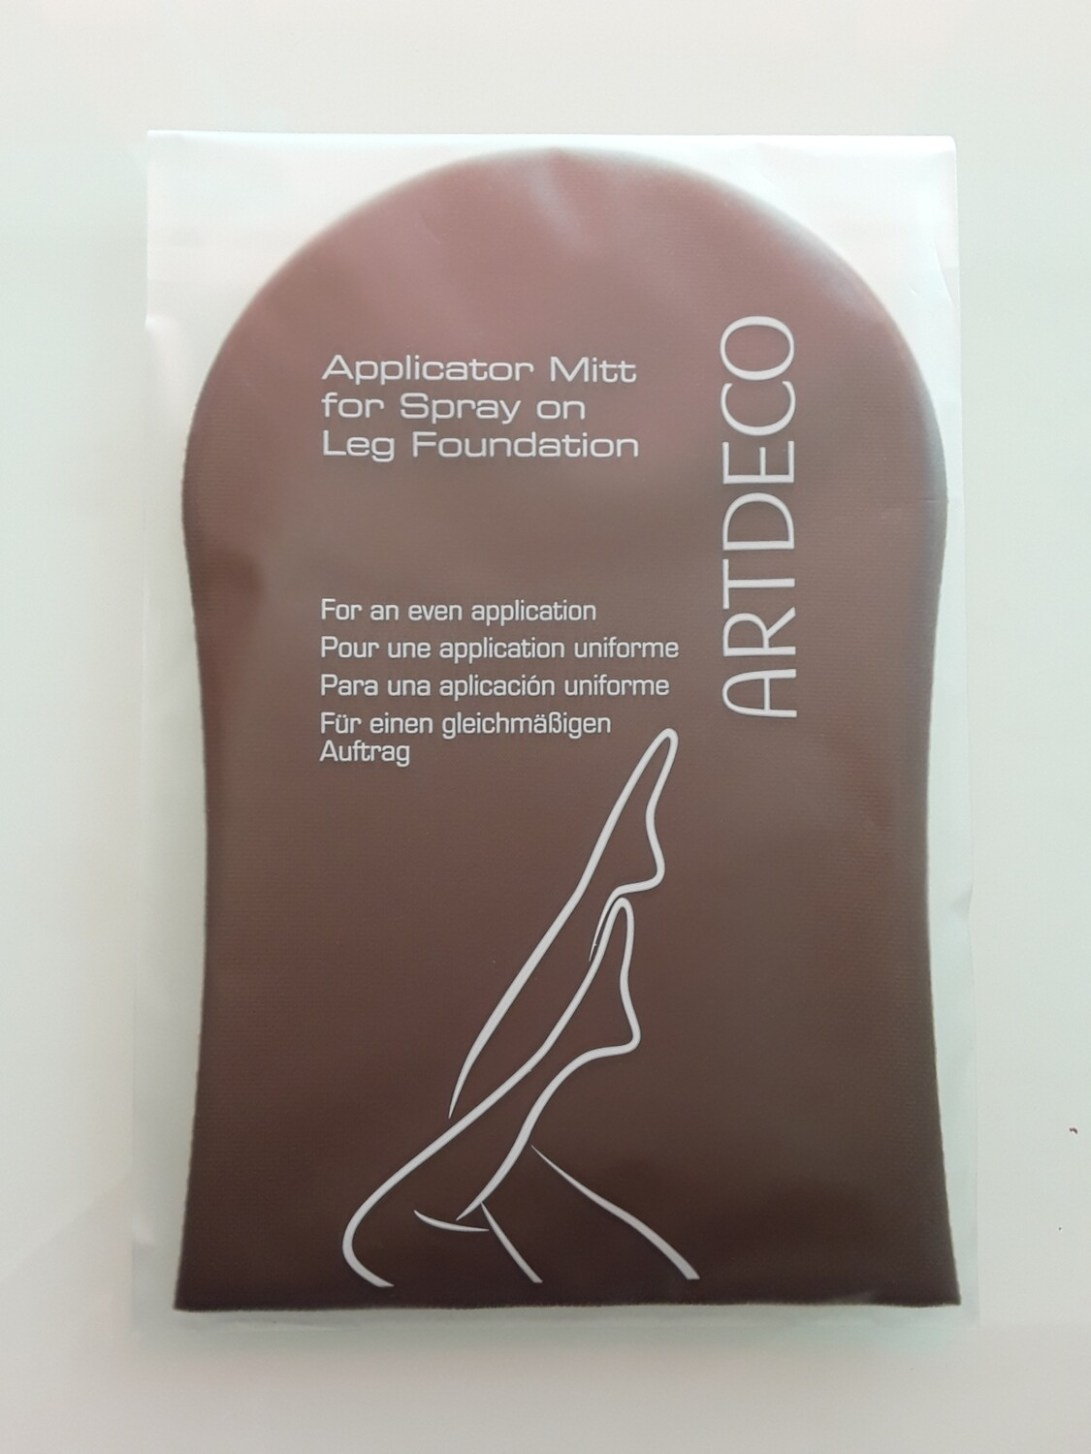 Gant applicateur pour spray on leg foundation